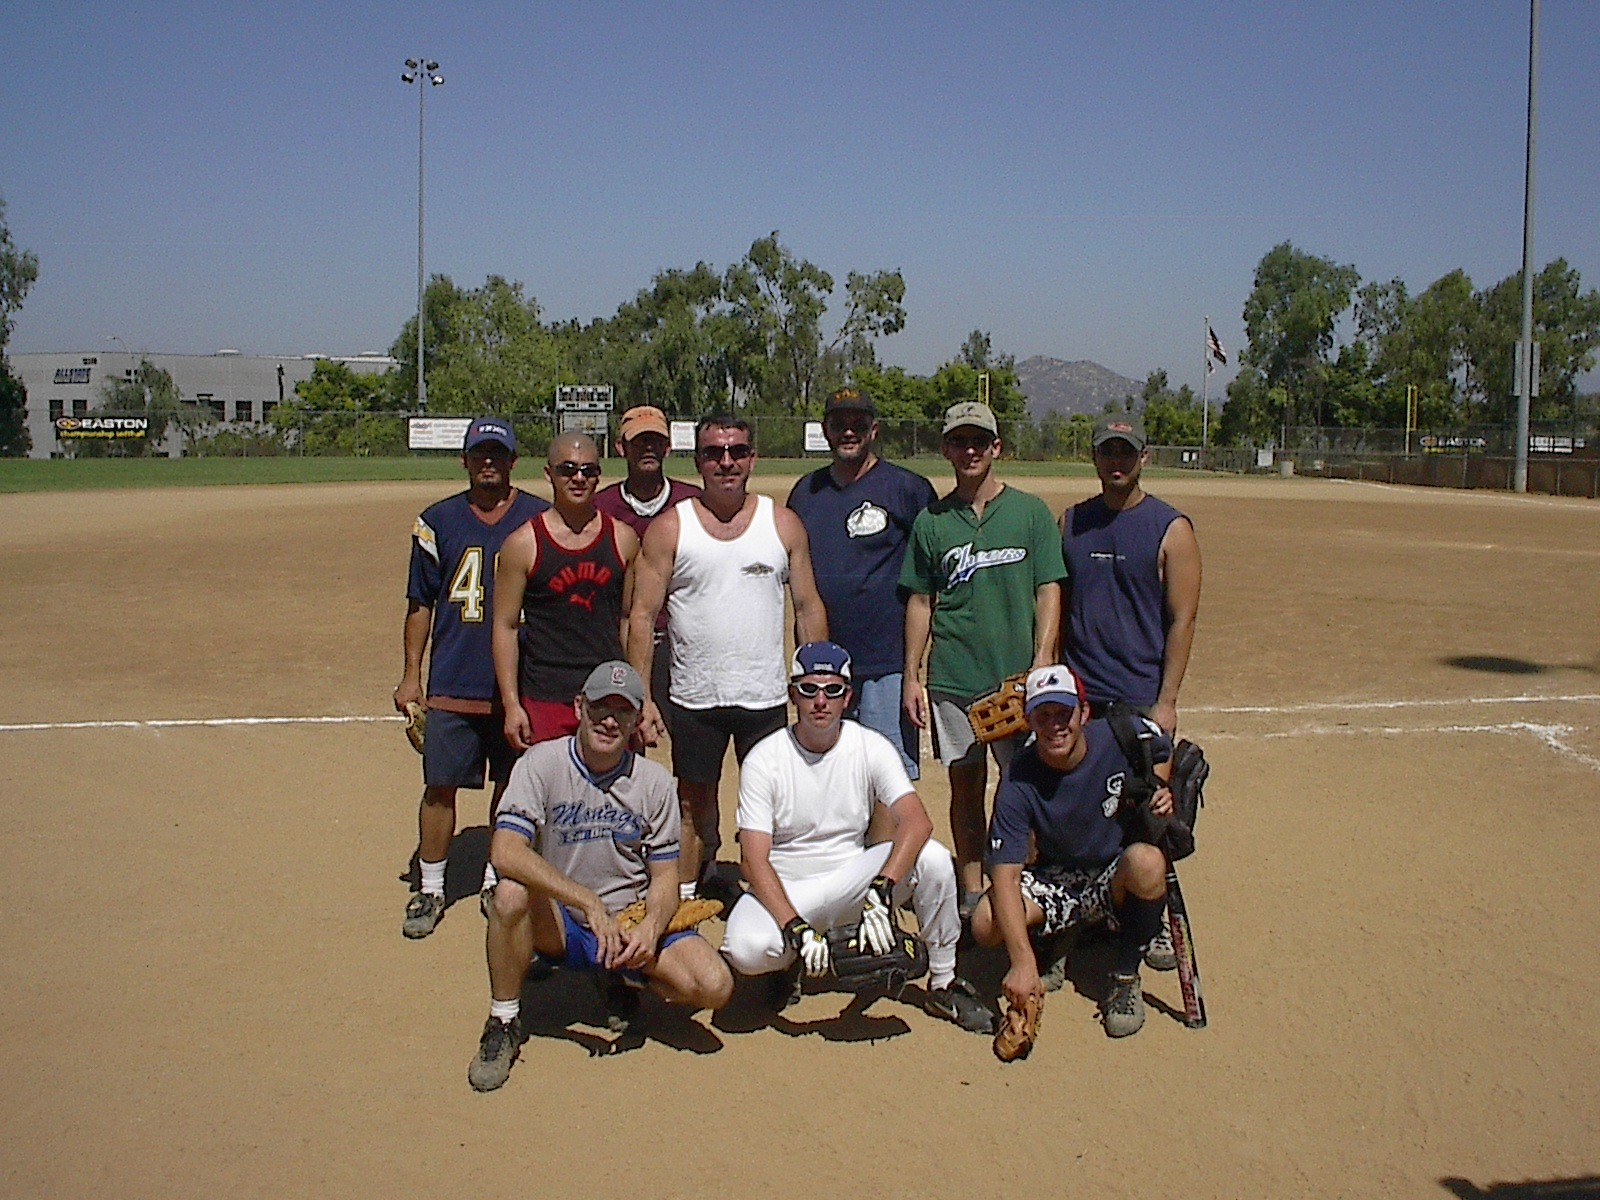 banditsfall2003.jpg